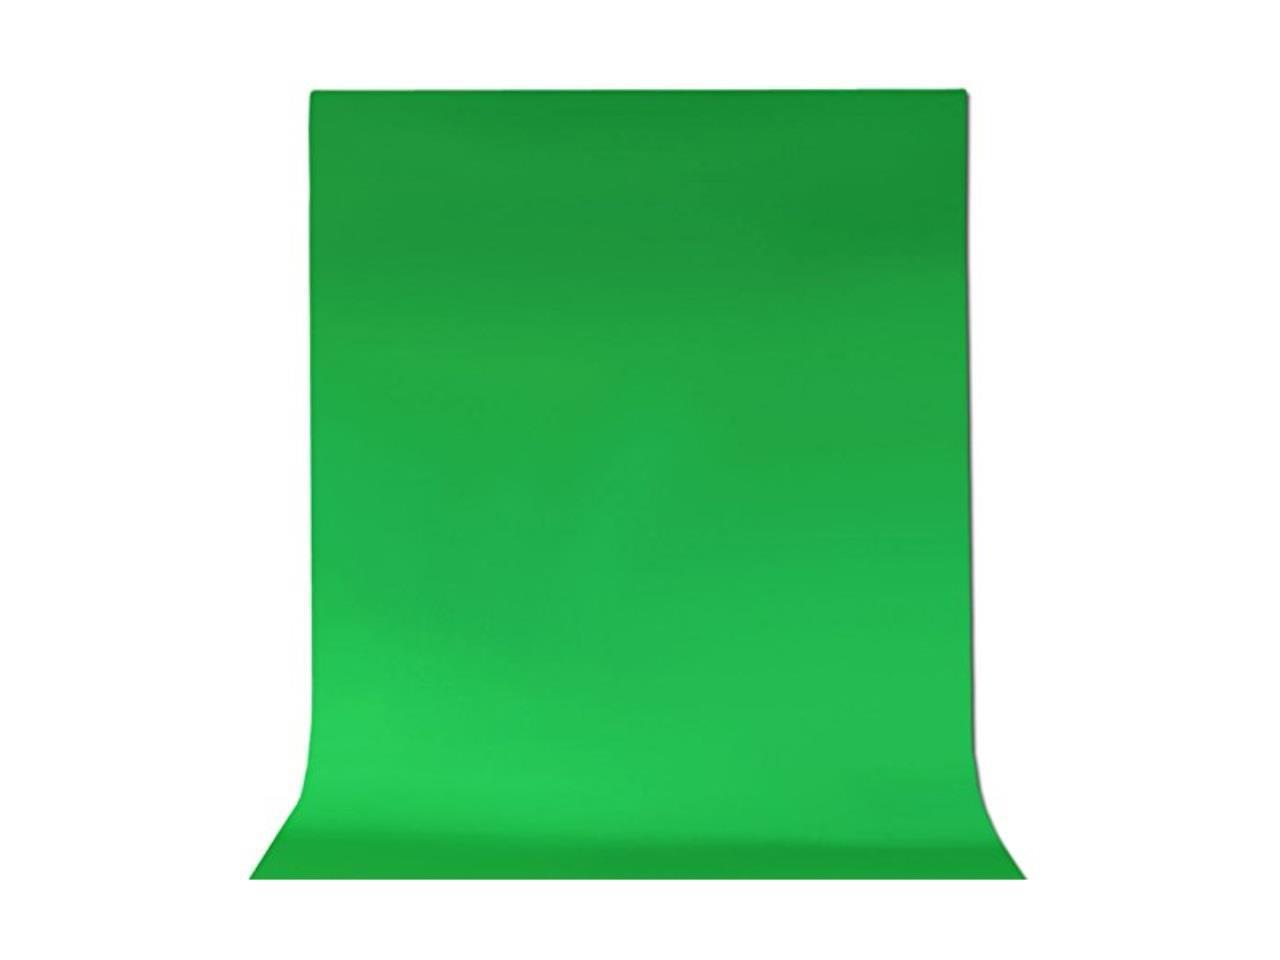 ePhotoInc 6 x 9 Feet Cotton Chromakey Green Screen Muslin Backdrop Photo Photography Background G69